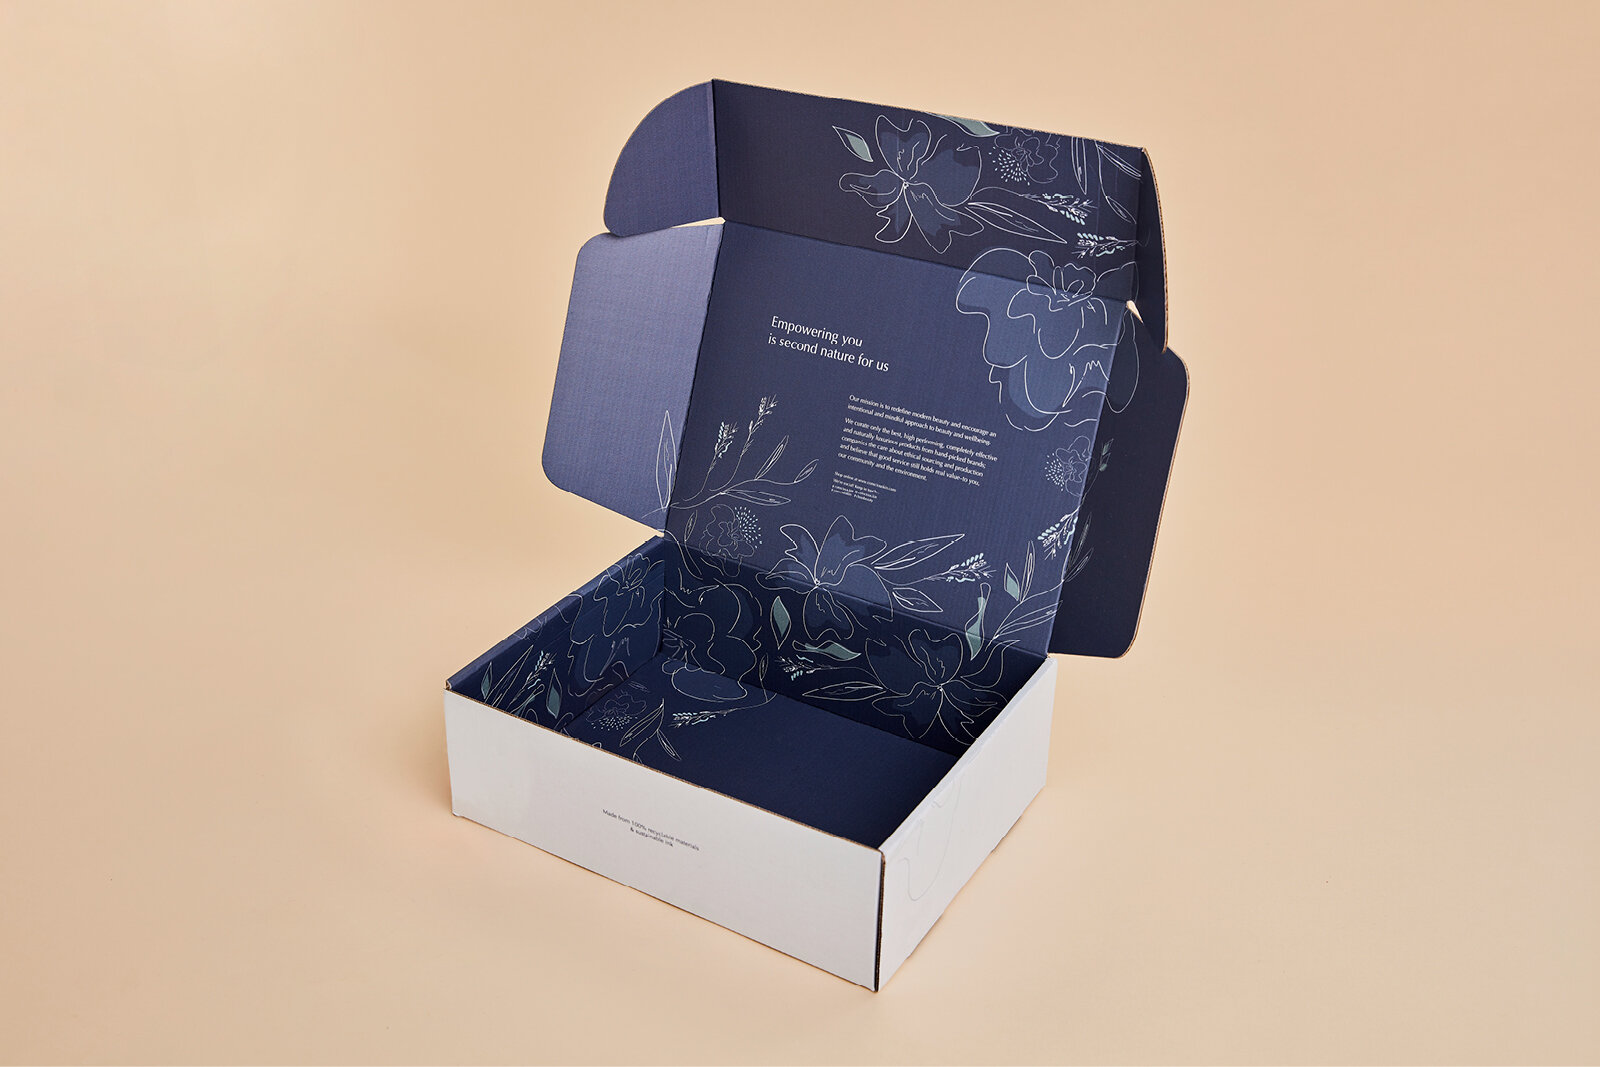 Conscious_Kin_Packaging_Design_Eco_Boutique_Studio_Brisbane_Graphic_Design2.jpg